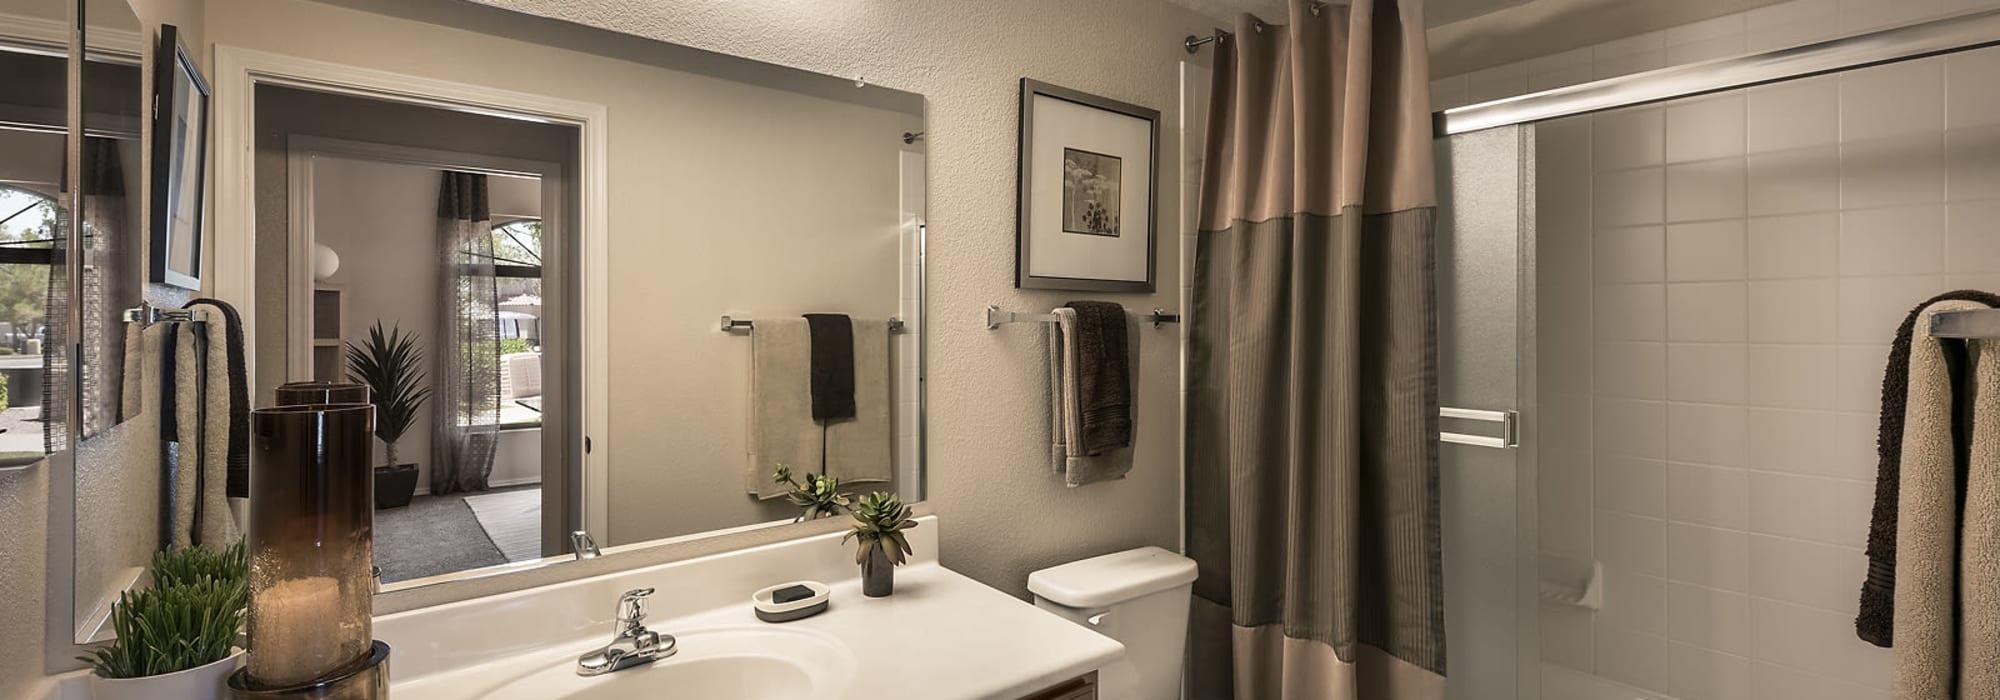 spacious bathroom at San Cervantes in Chandler, Arizona